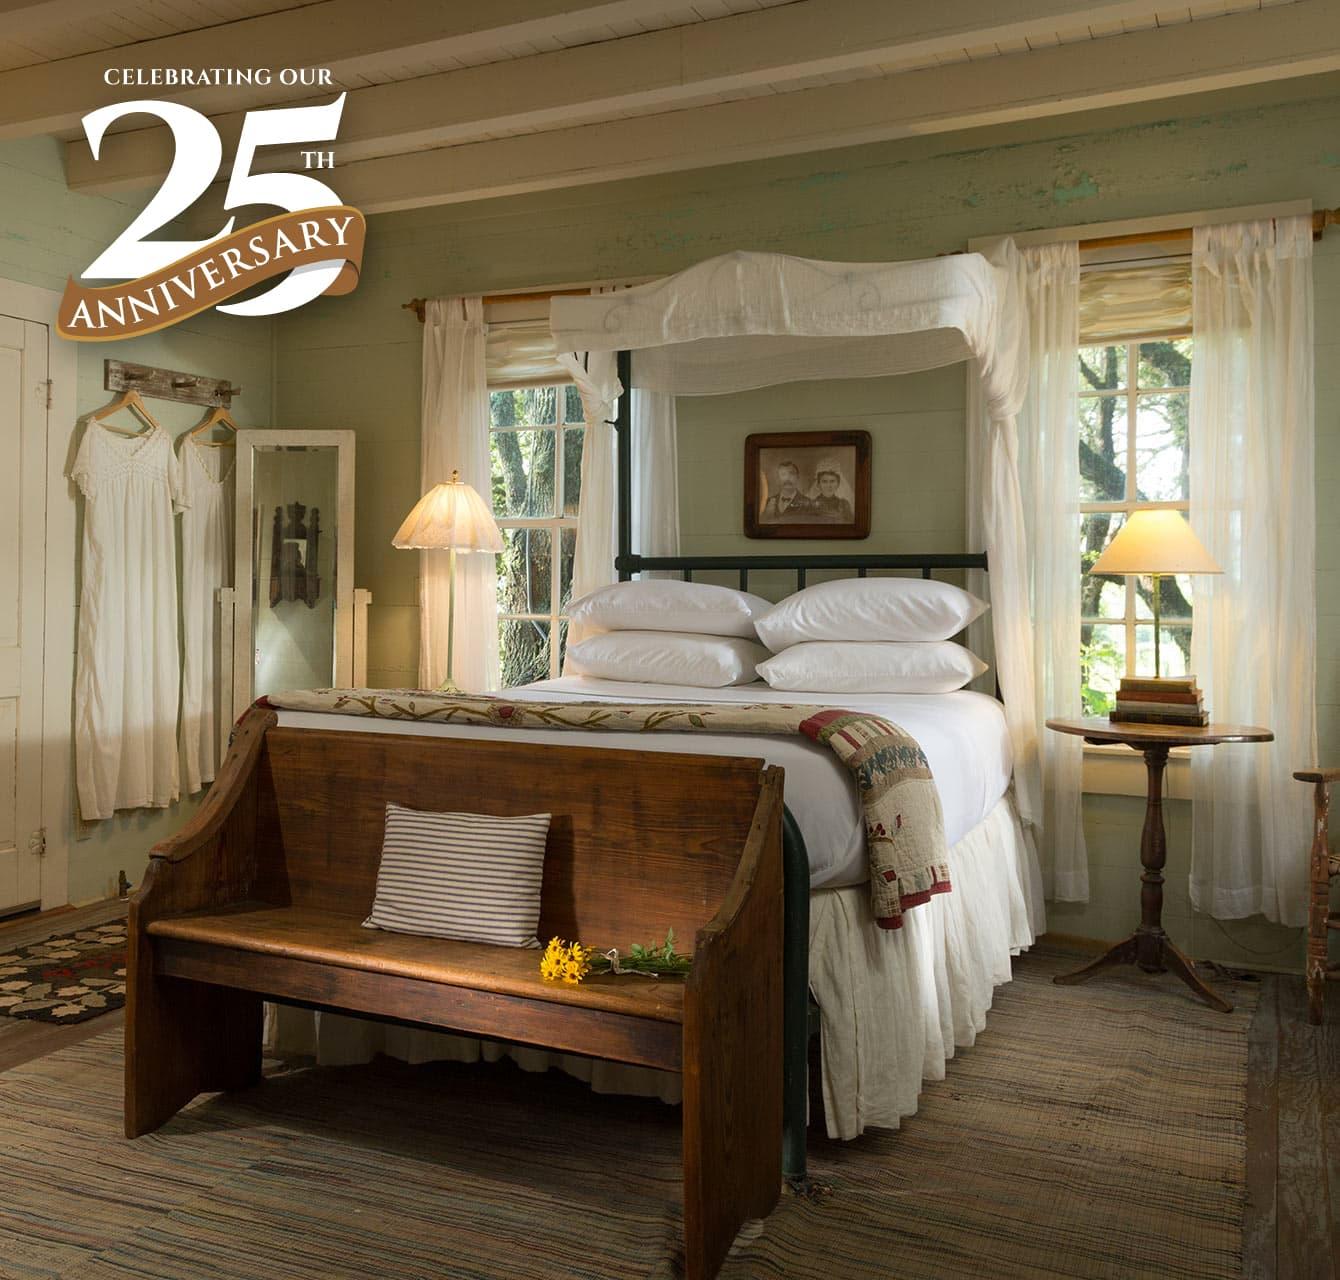 BlissWood bedroom celebrating 25th anniversary